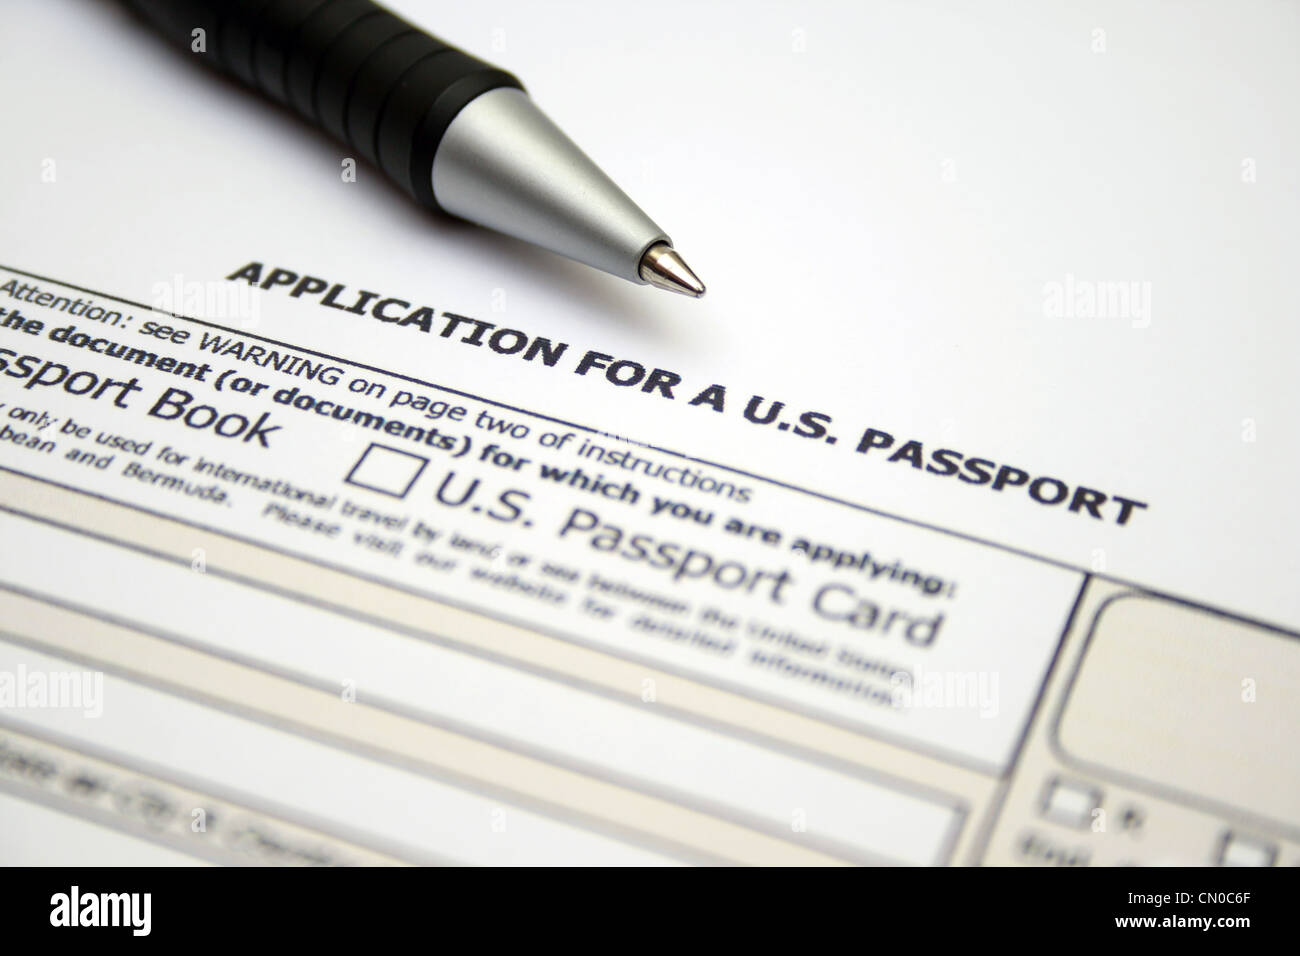 canadian passport application form infant